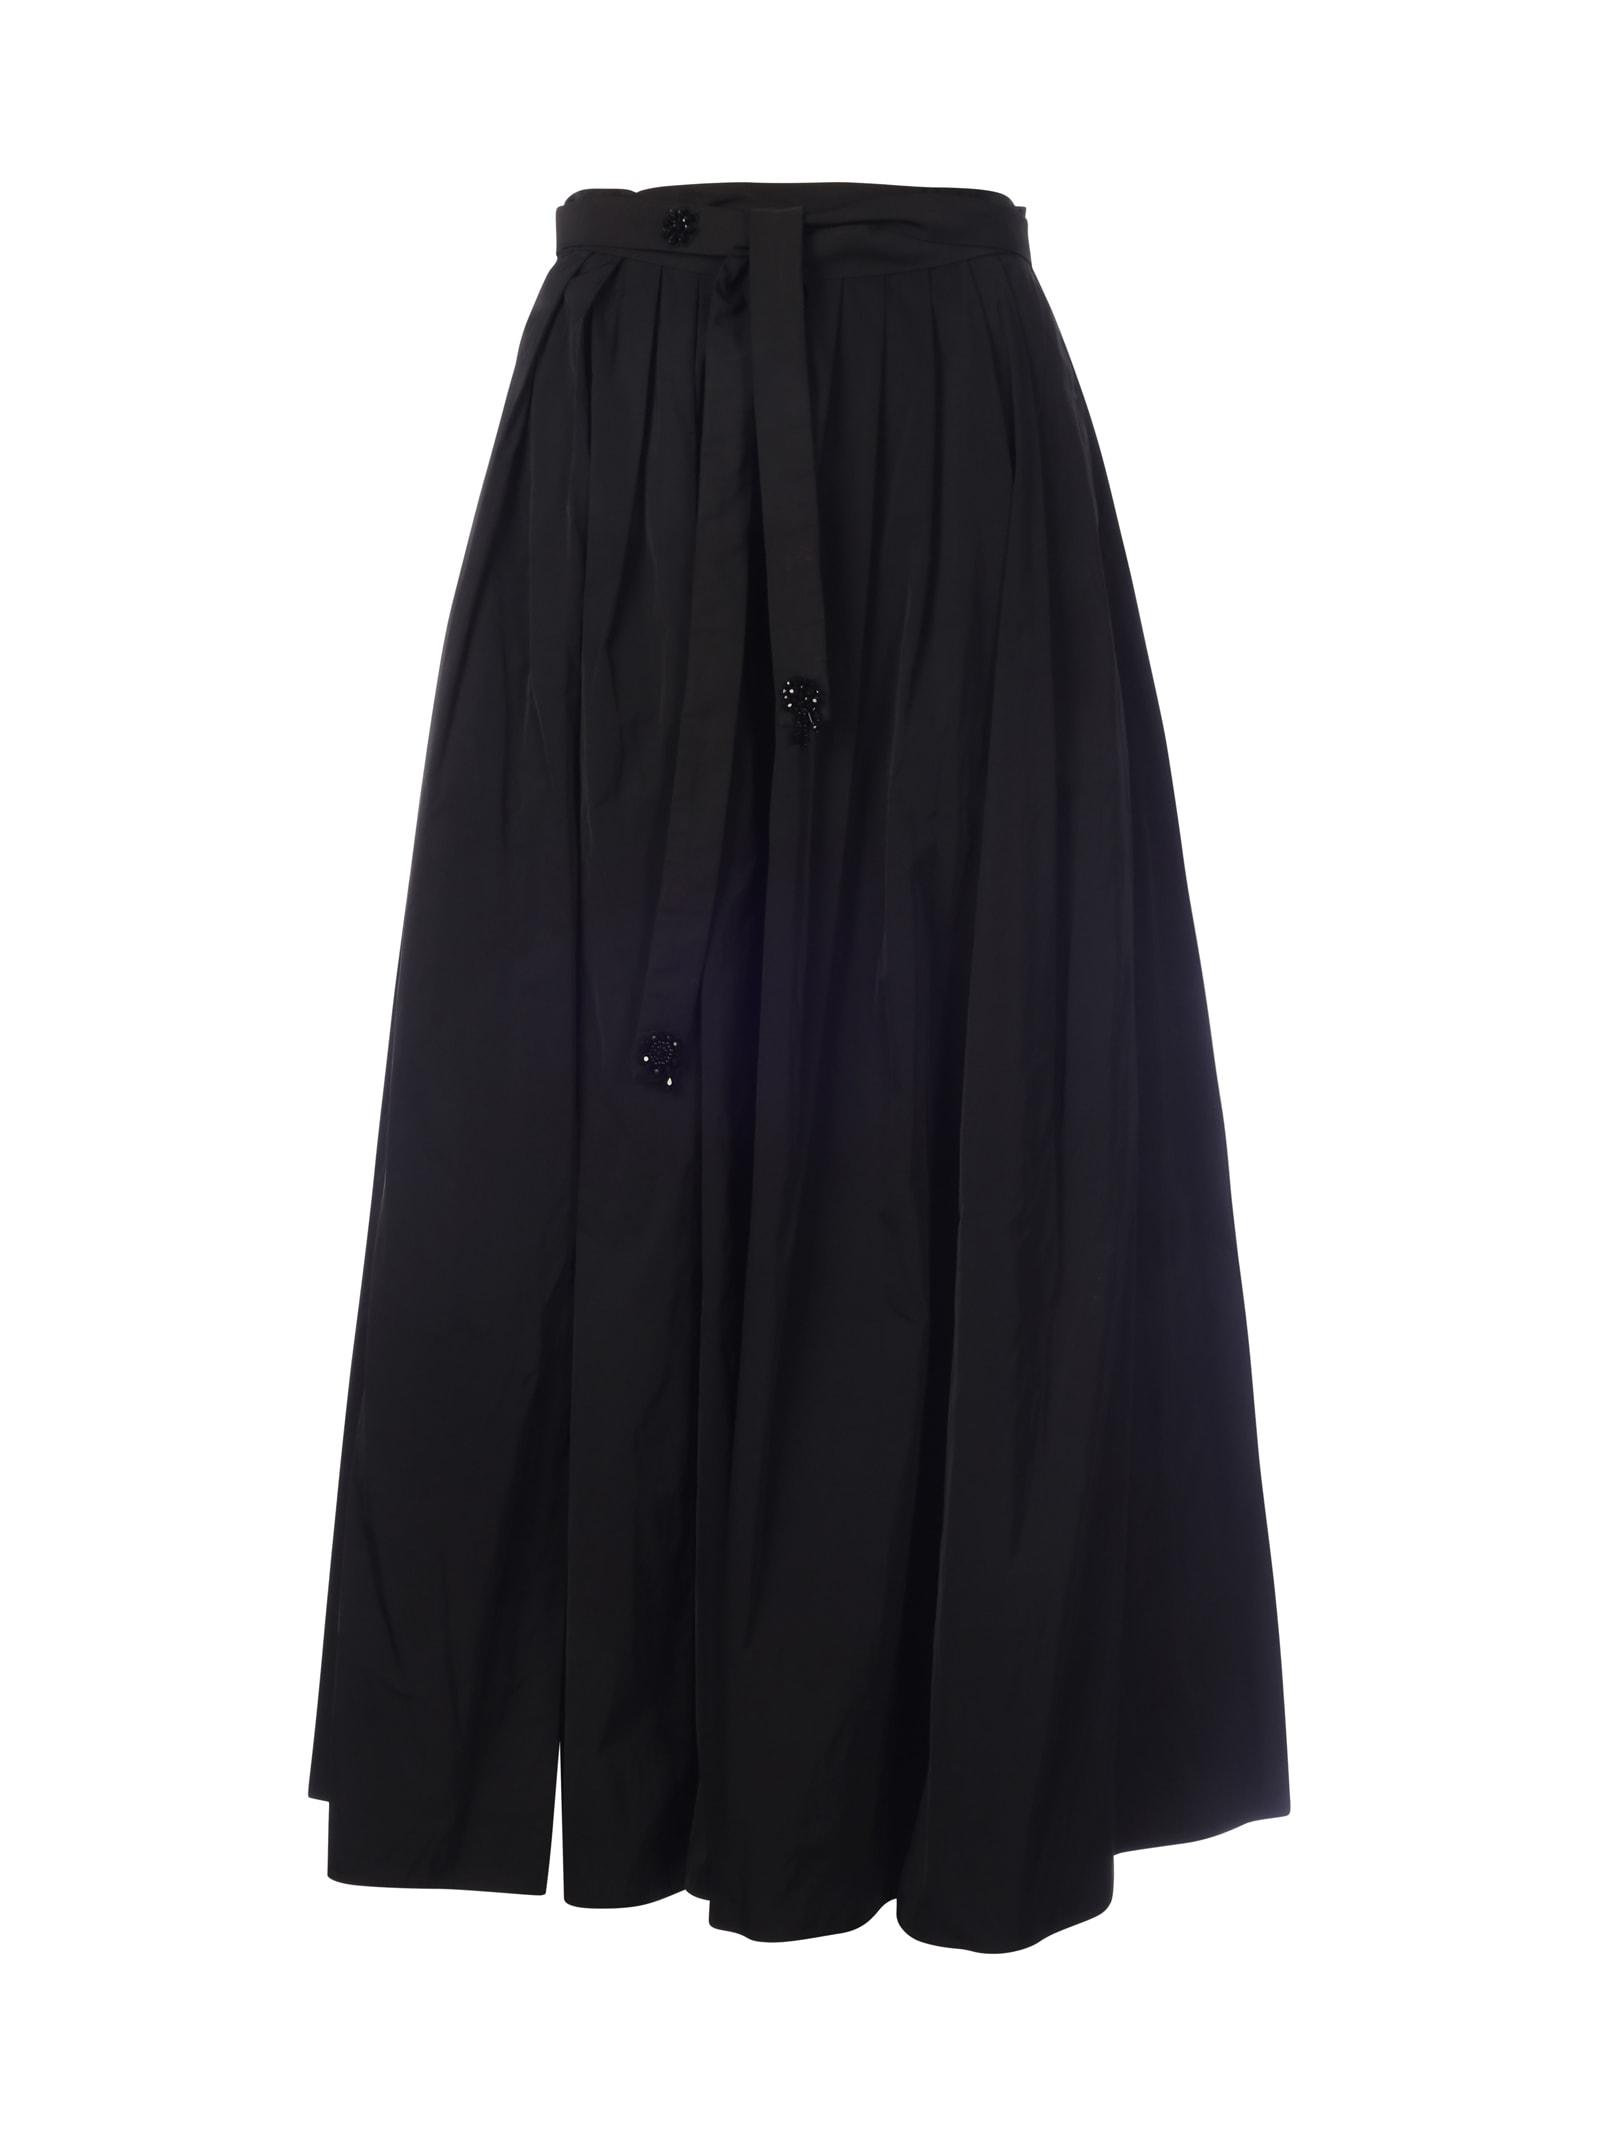 S Max Mara Askirt Skirt